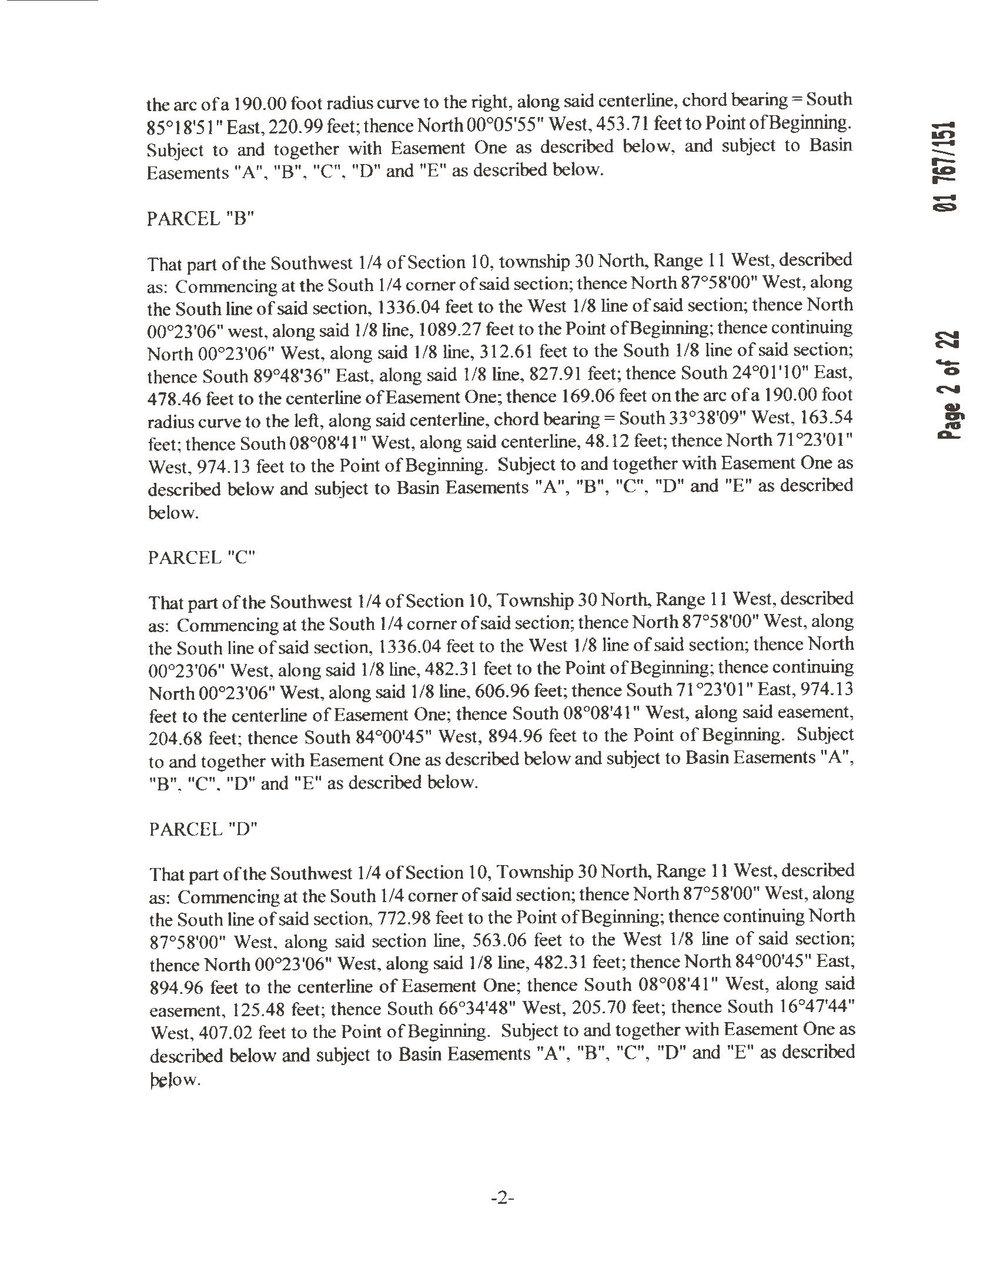 11635 E Belanger Woods Dr Marketing Packet - For Sale by Oltersdorf Realty LLC (22).jpg